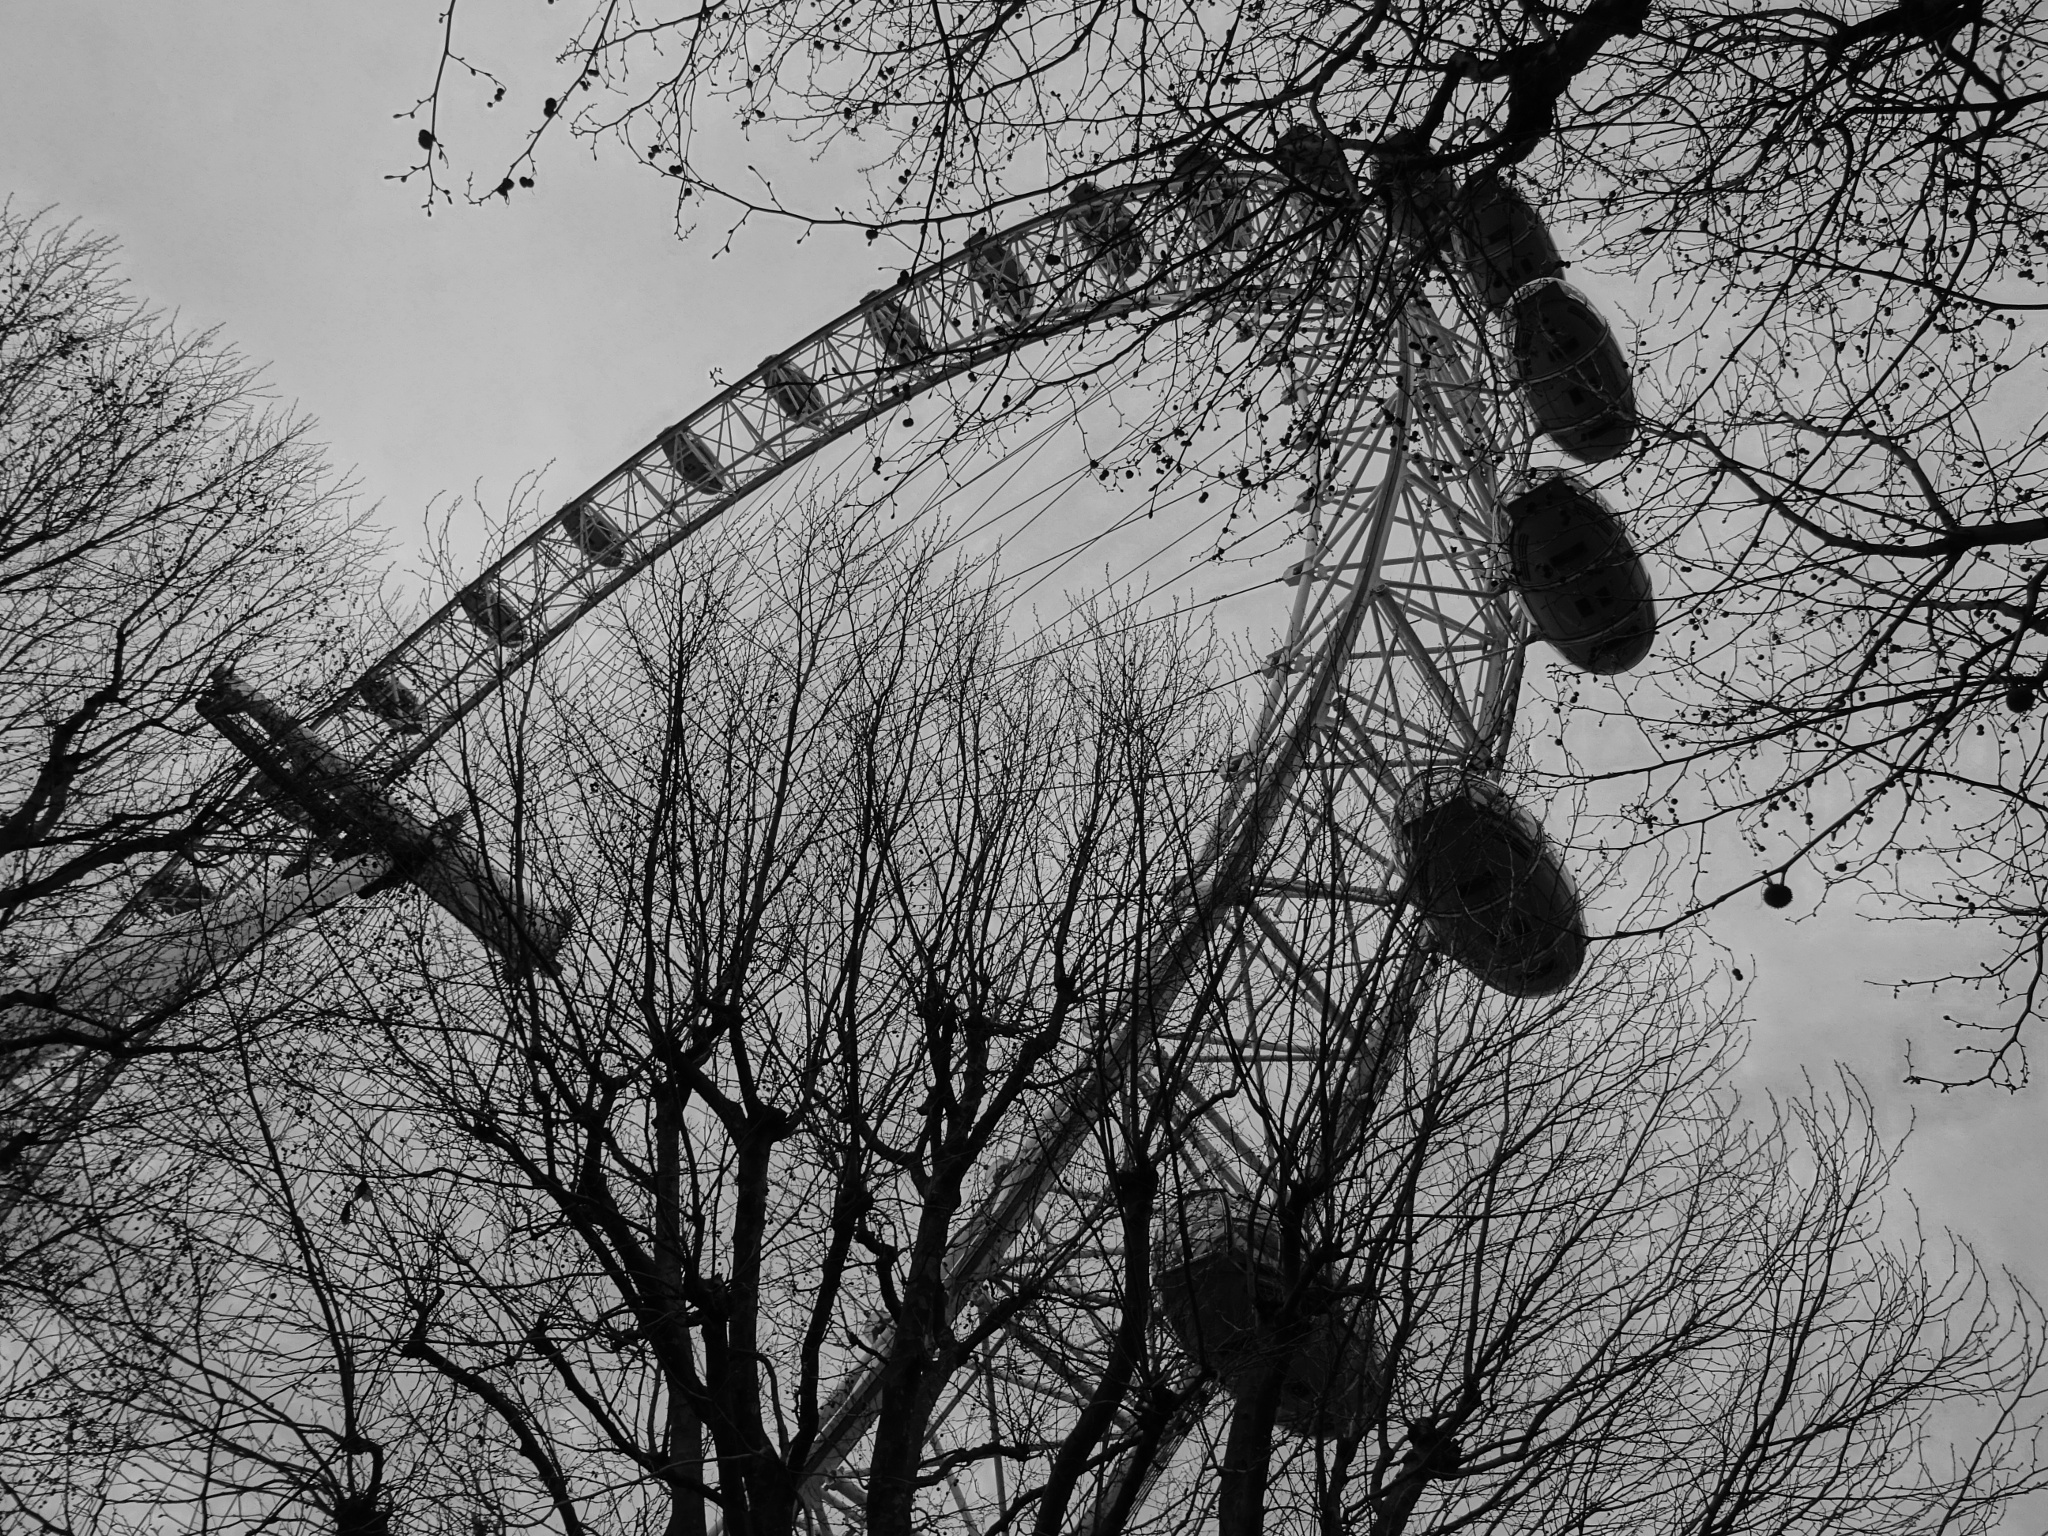 London Eye by erol.antz